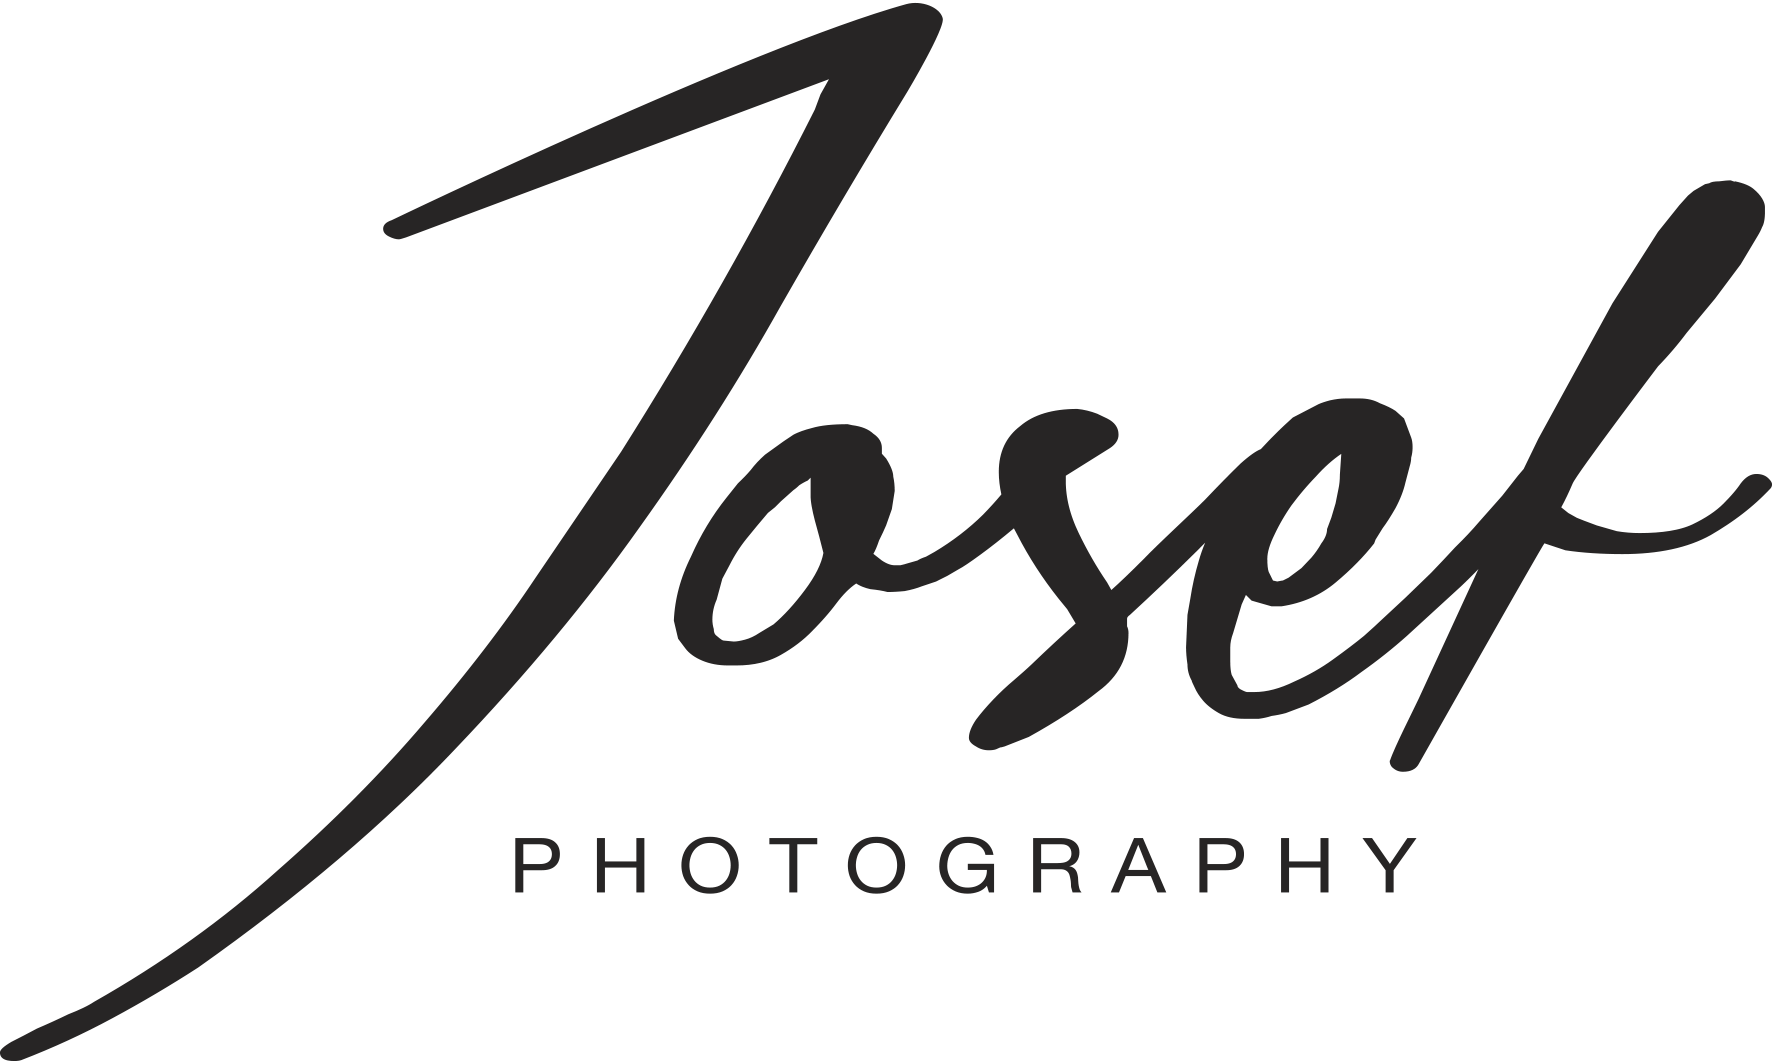 Josef photography